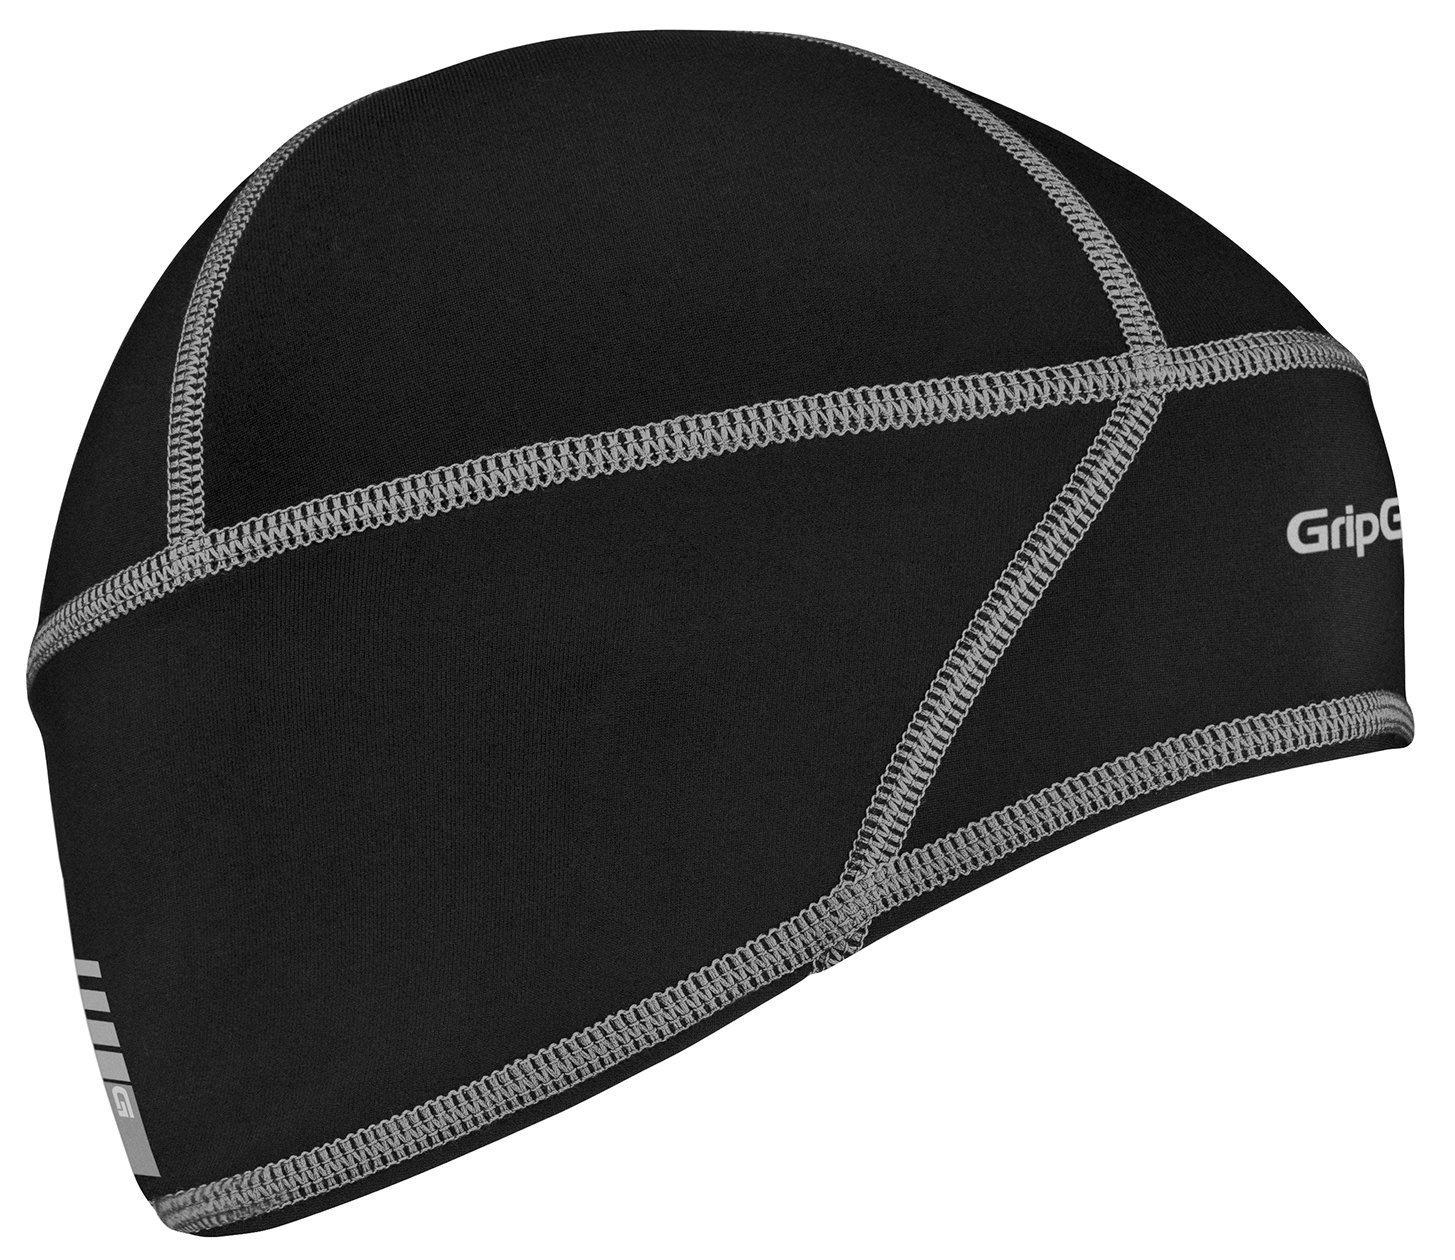 GripGrab Termo Skull Cap til børn - hjelmhue (One Size)